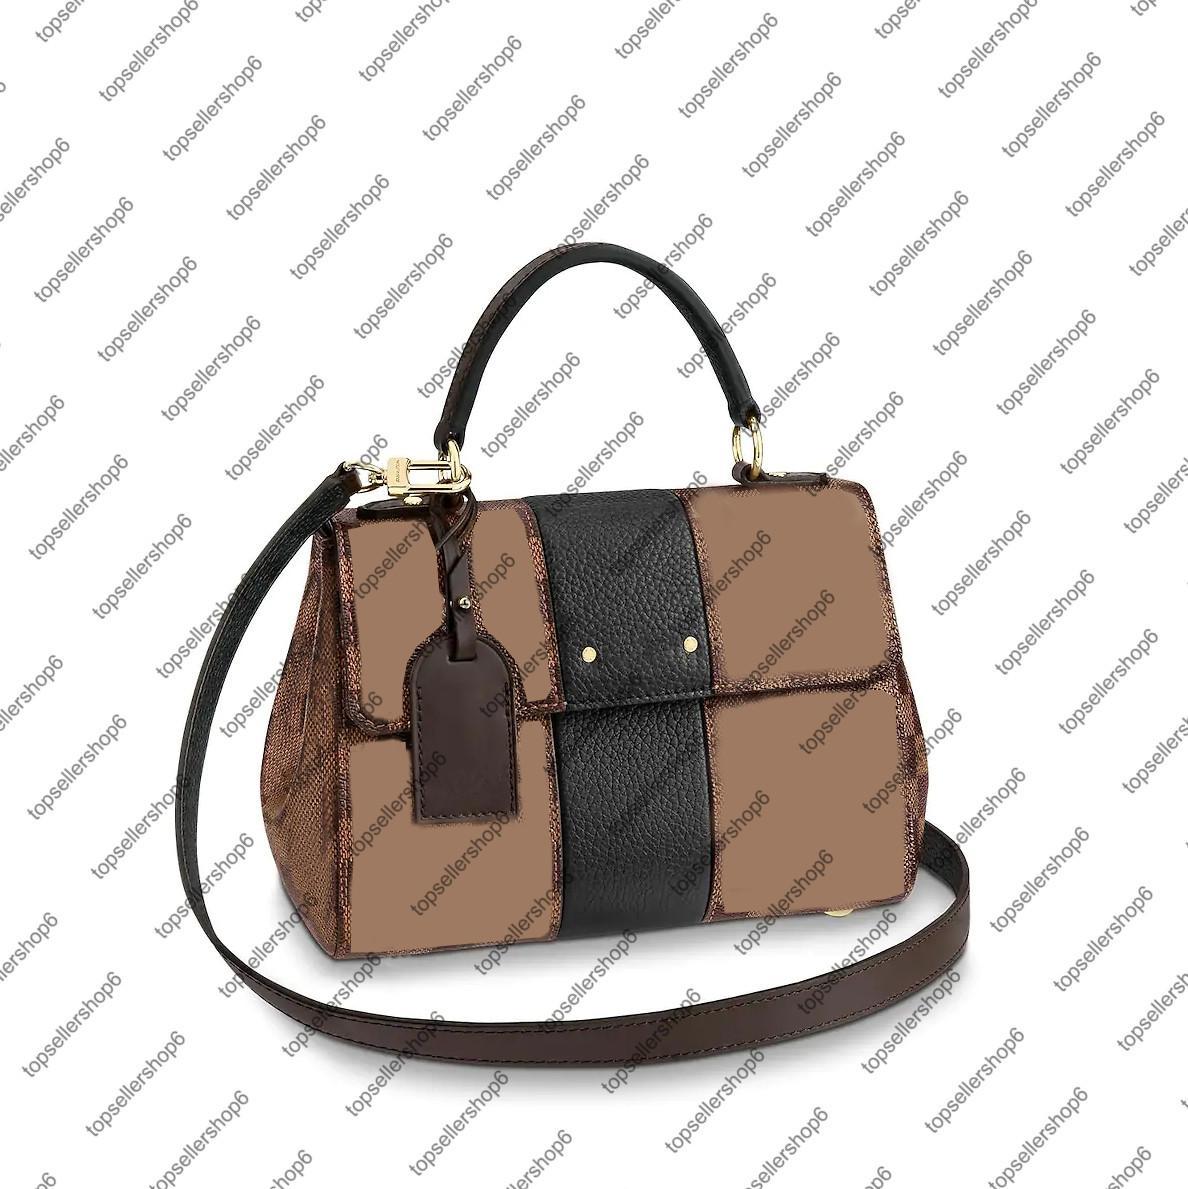 N41073 سندات شارع bb مخلب قماش أعلى مقبض رسول المرأة جلد طبيعي مصمم محفظة حقيبة كتف حقيبة يد